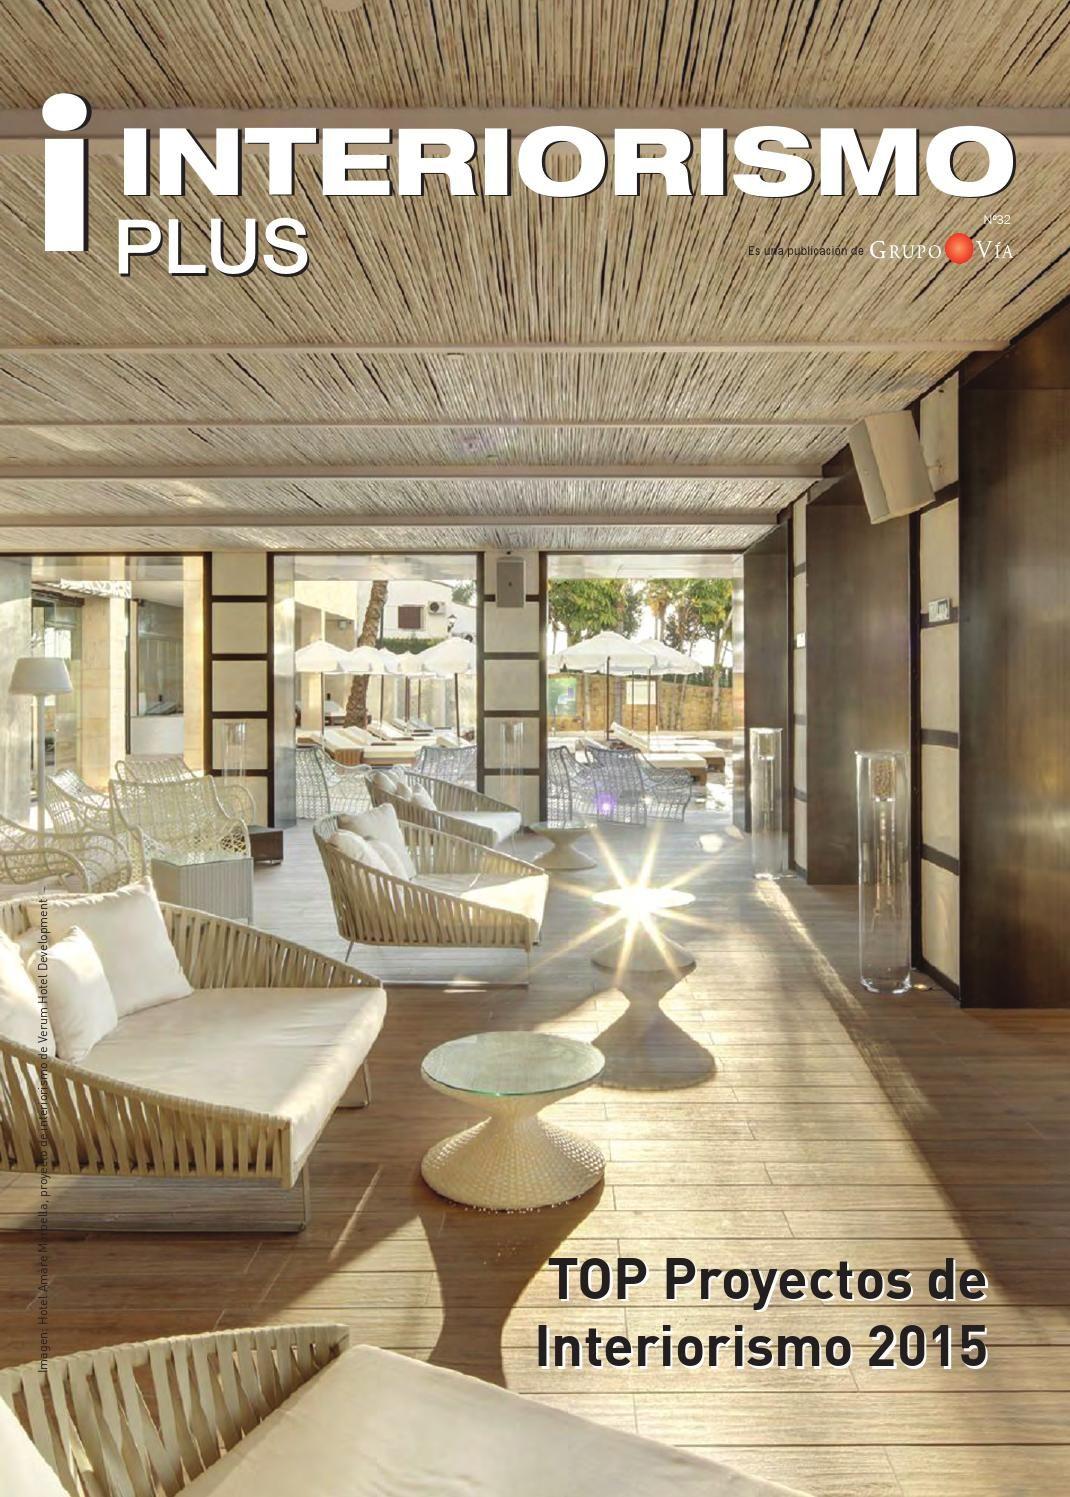 Interiorismo Plus nº32  Top Proyectos de Interiorismo 2015 Top Spanish Design Interior Projects 2015